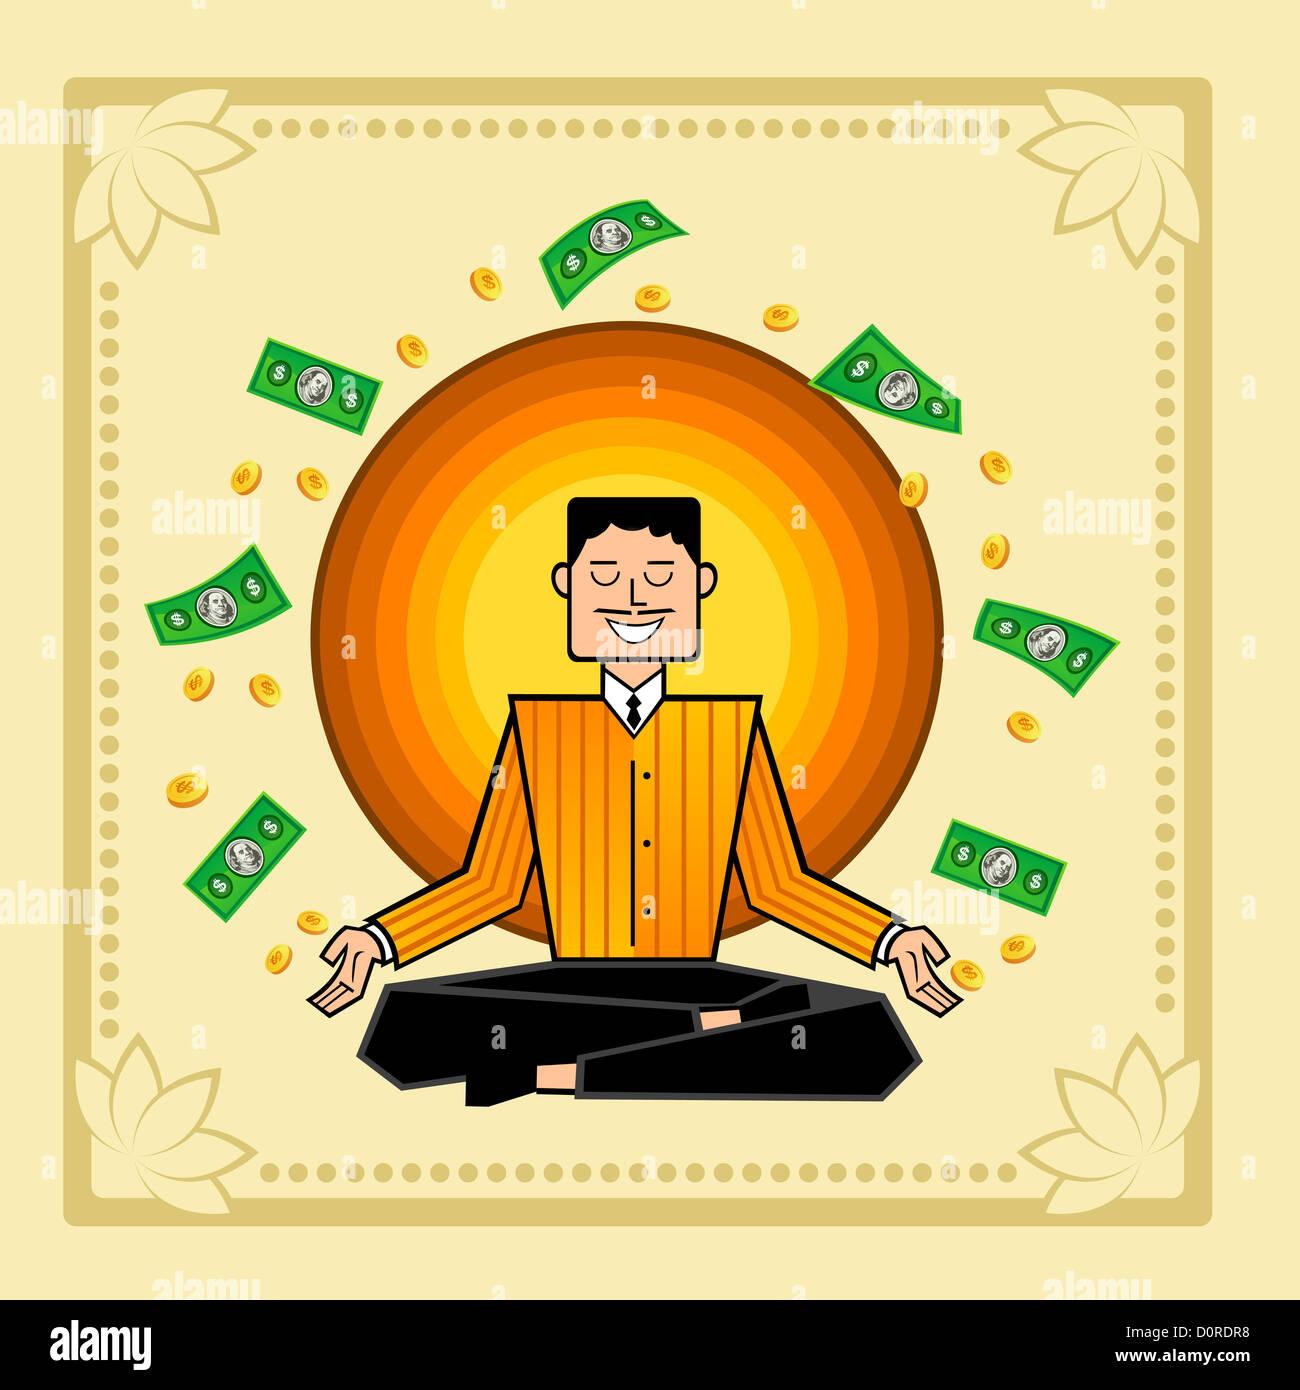 Man meditating with money swirling - Stock Image